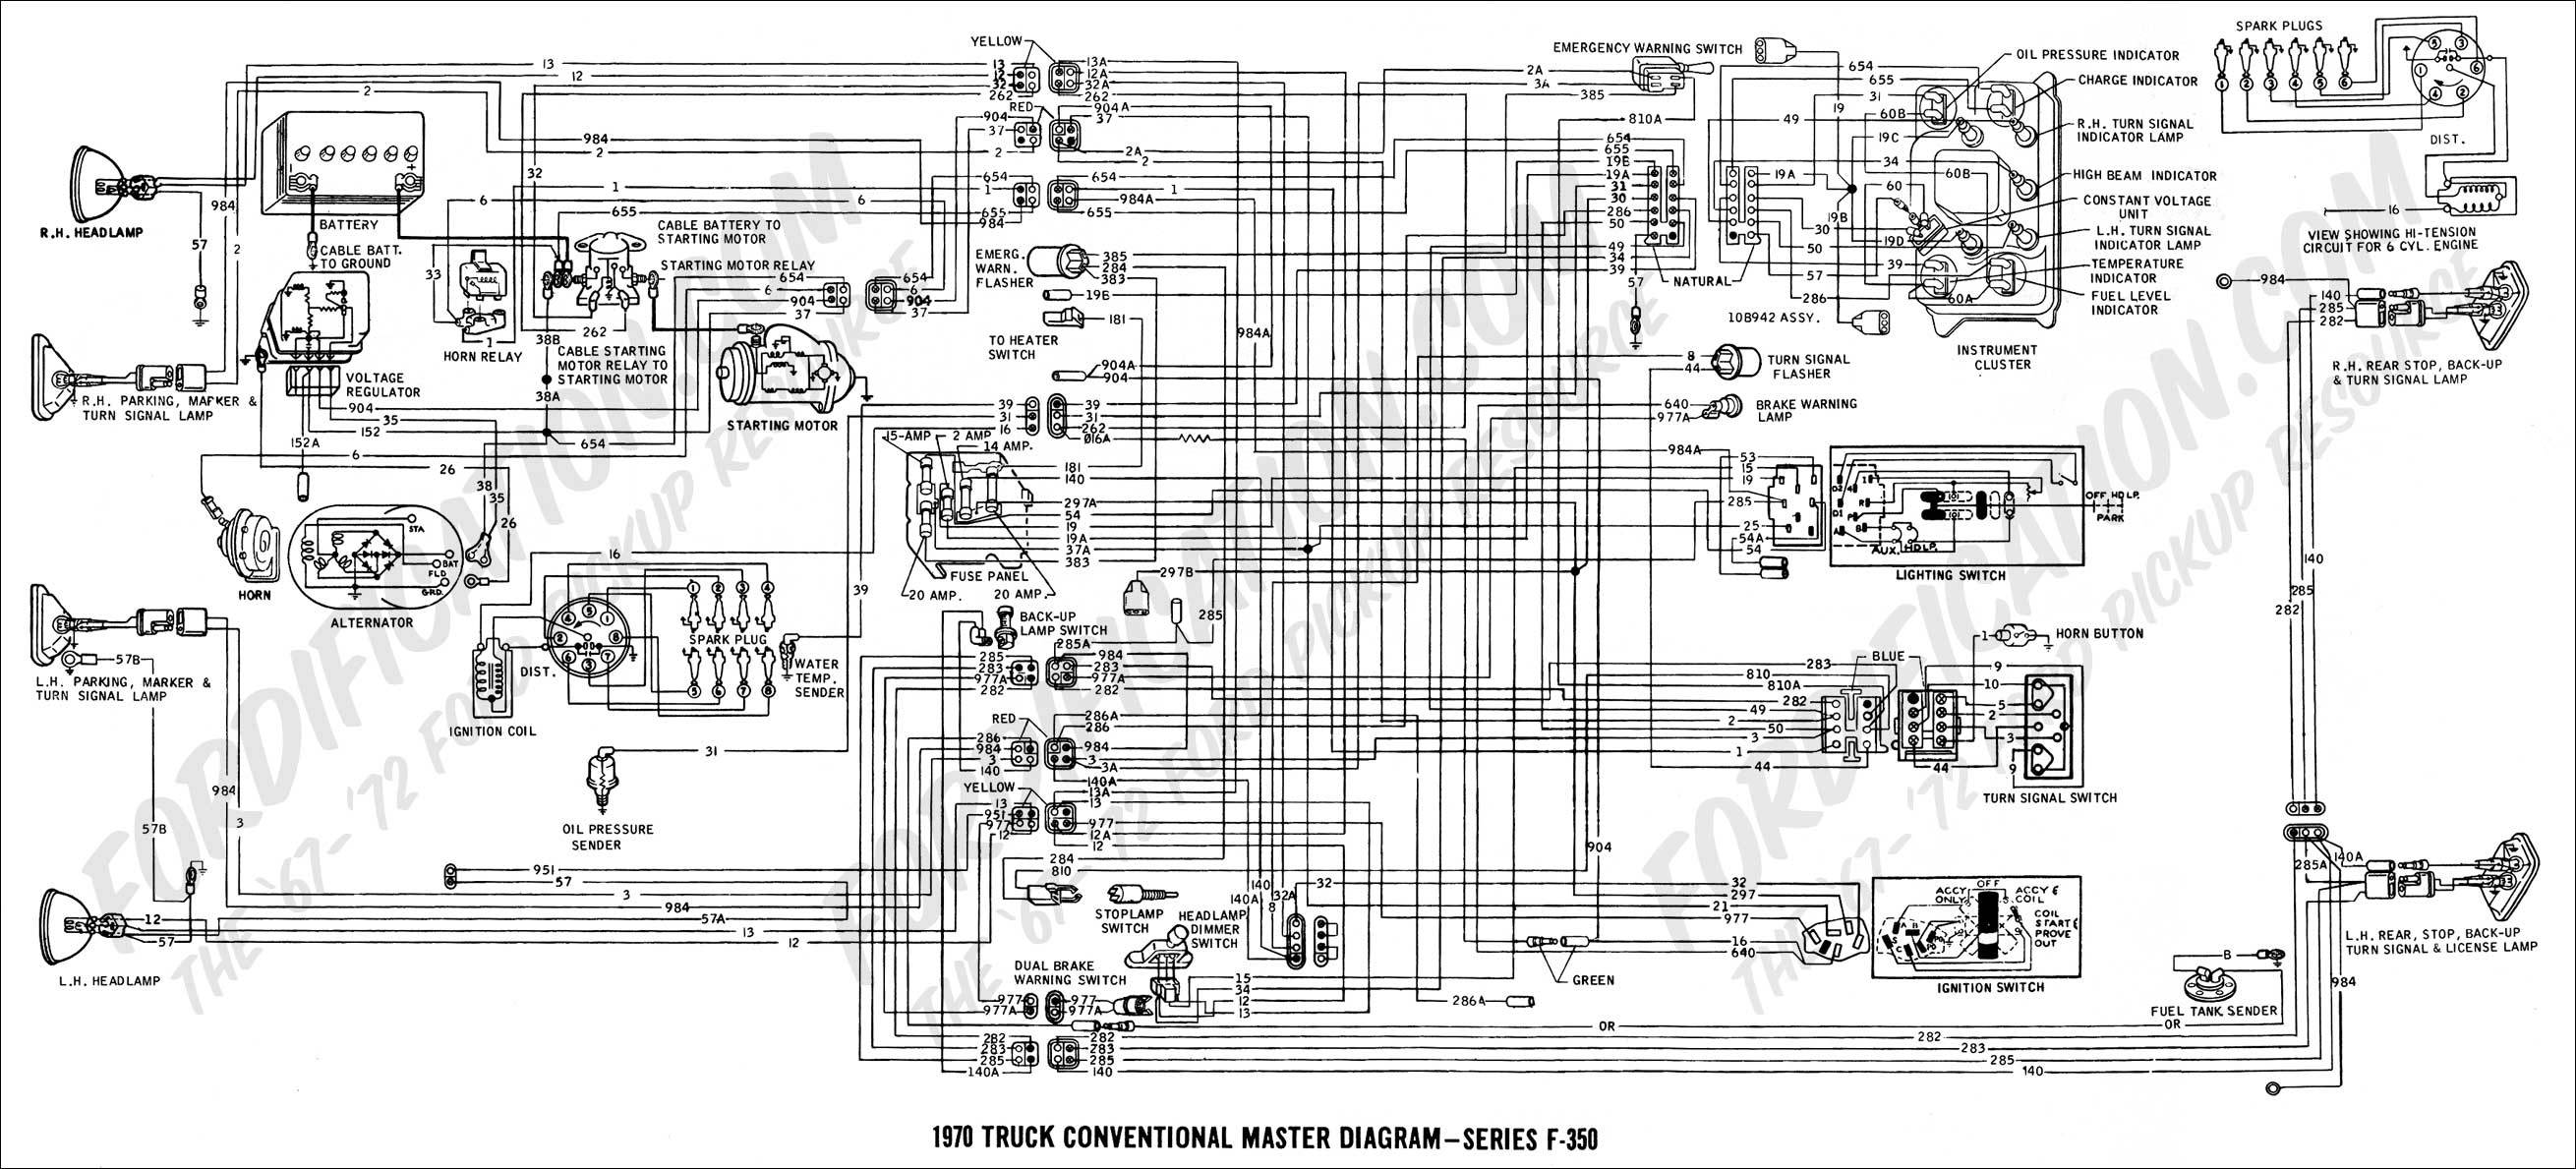 [SCHEMATICS_4JK]  RN_0764] 359 Peterbilt Wiring Diagram Download Diagram | 1983 Peterbilt Wiring Diagram |  | Coun Penghe Ilari Gresi Chro Carn Ospor Garna Grebs Unho Rele  Mohammedshrine Librar Wiring 101